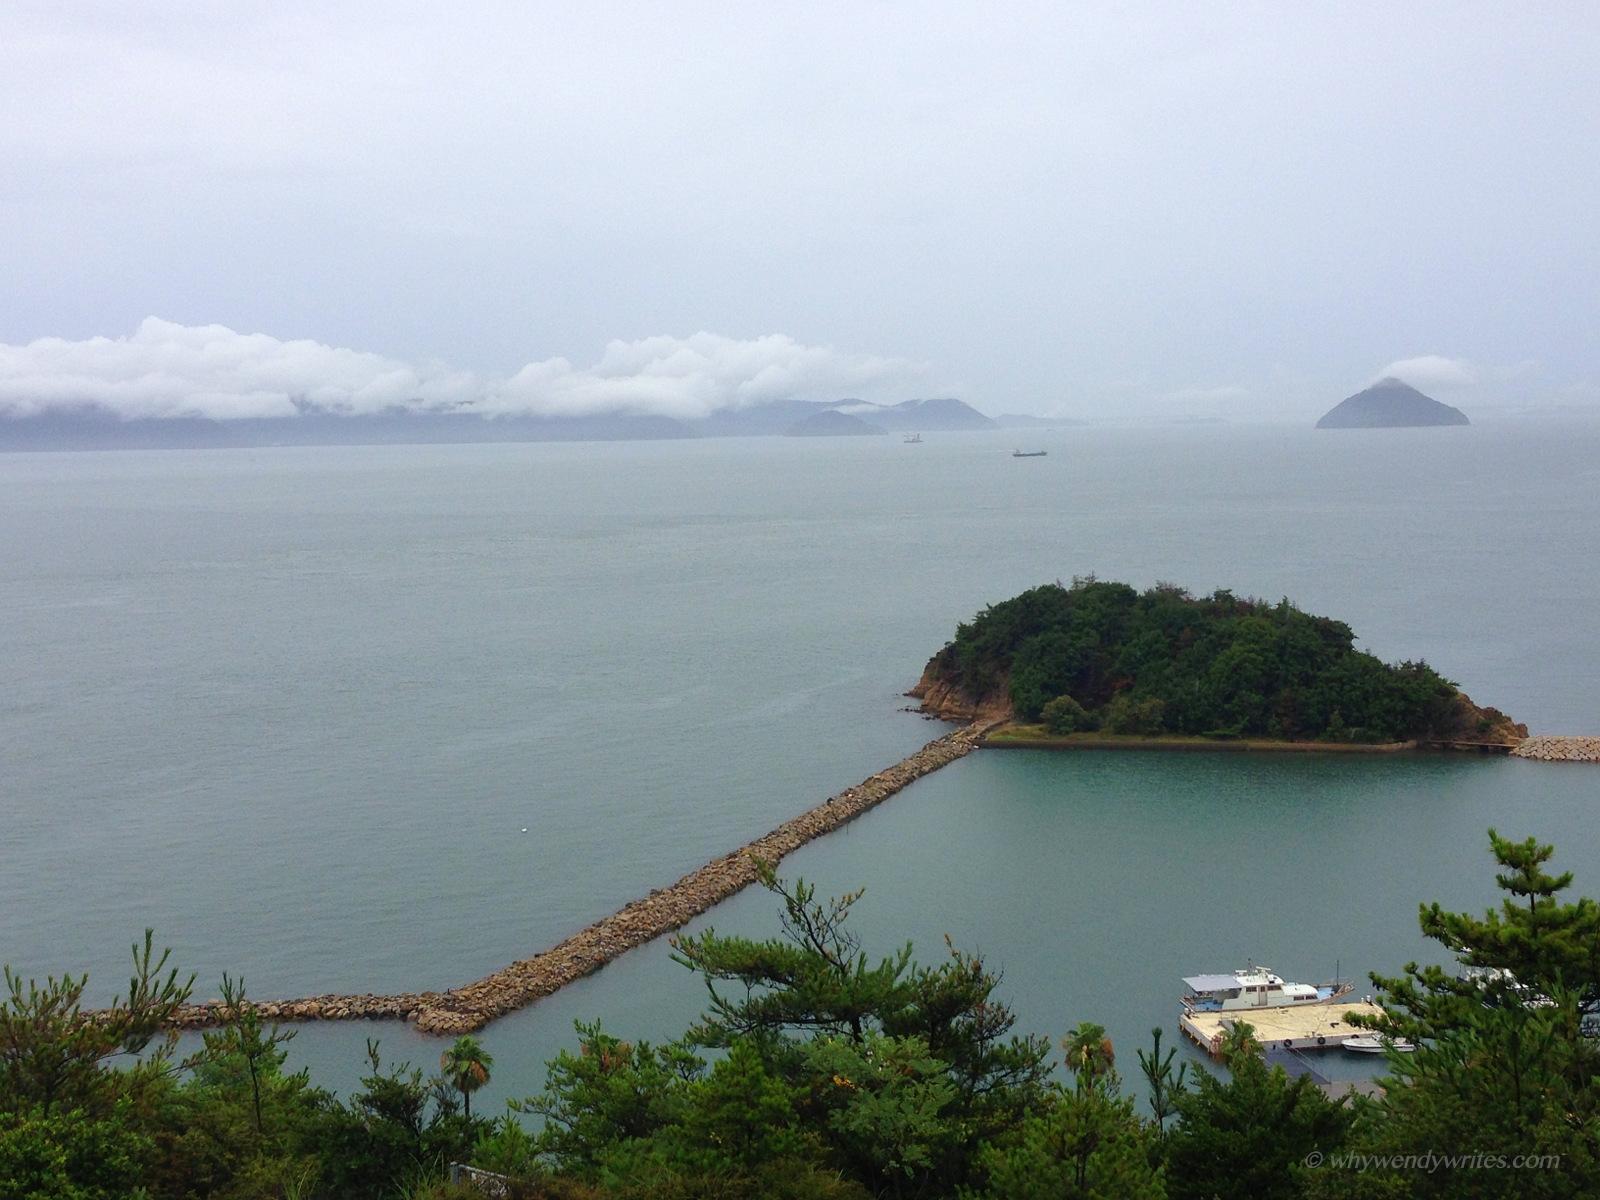 Scenic view of Seto Inland Sea from Chichu Café (Chichu Art Museum's Chichu Café)